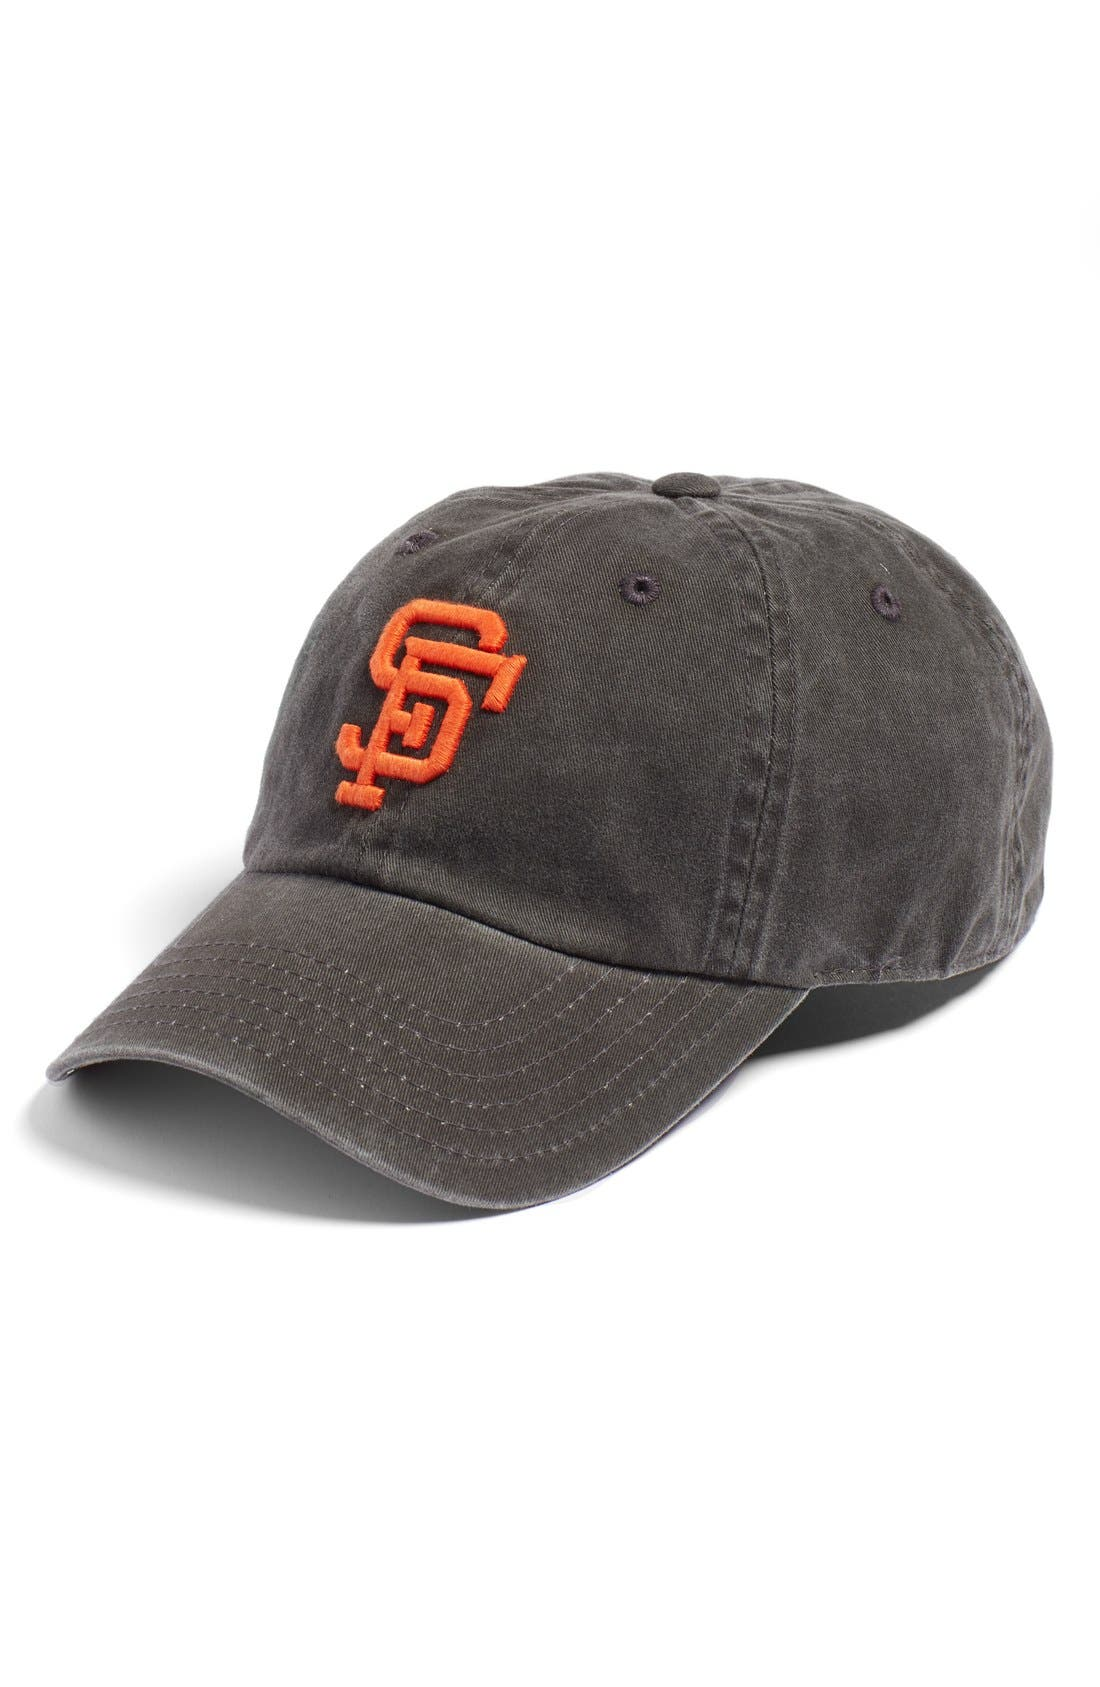 American Needle New Raglan San Francisco Giants Baseball Cap